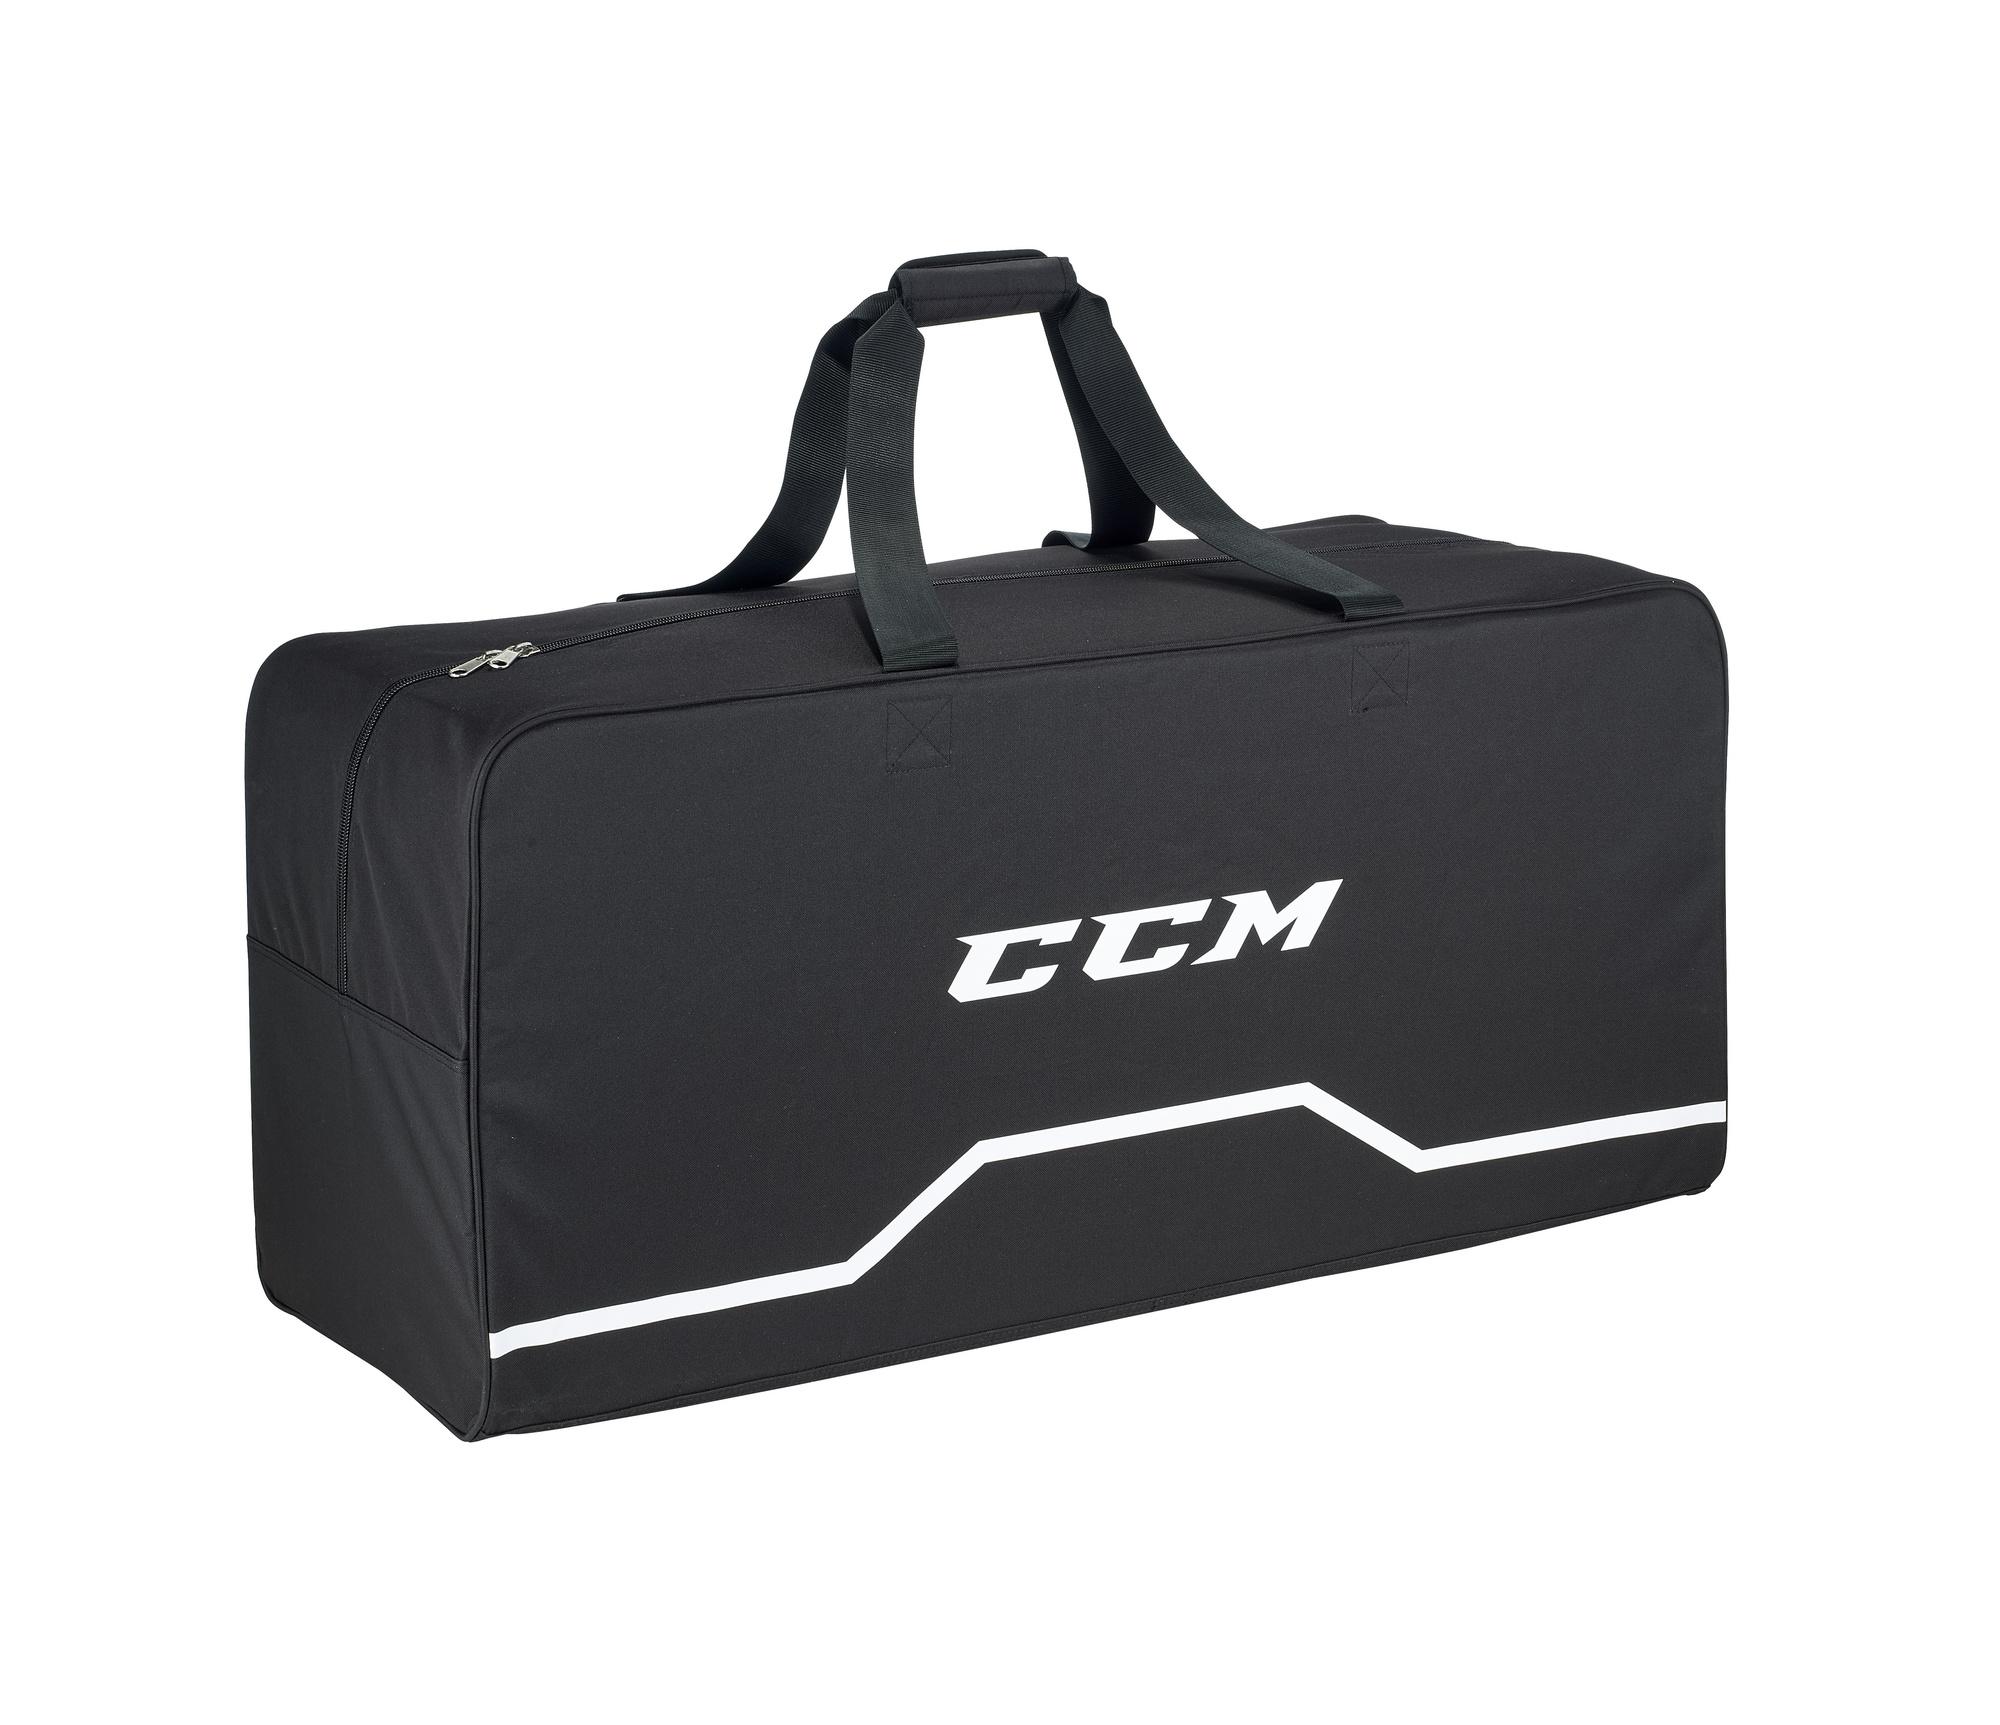 "Taška CCM 310 Core Carry Bag, černá, Senior, 38"""